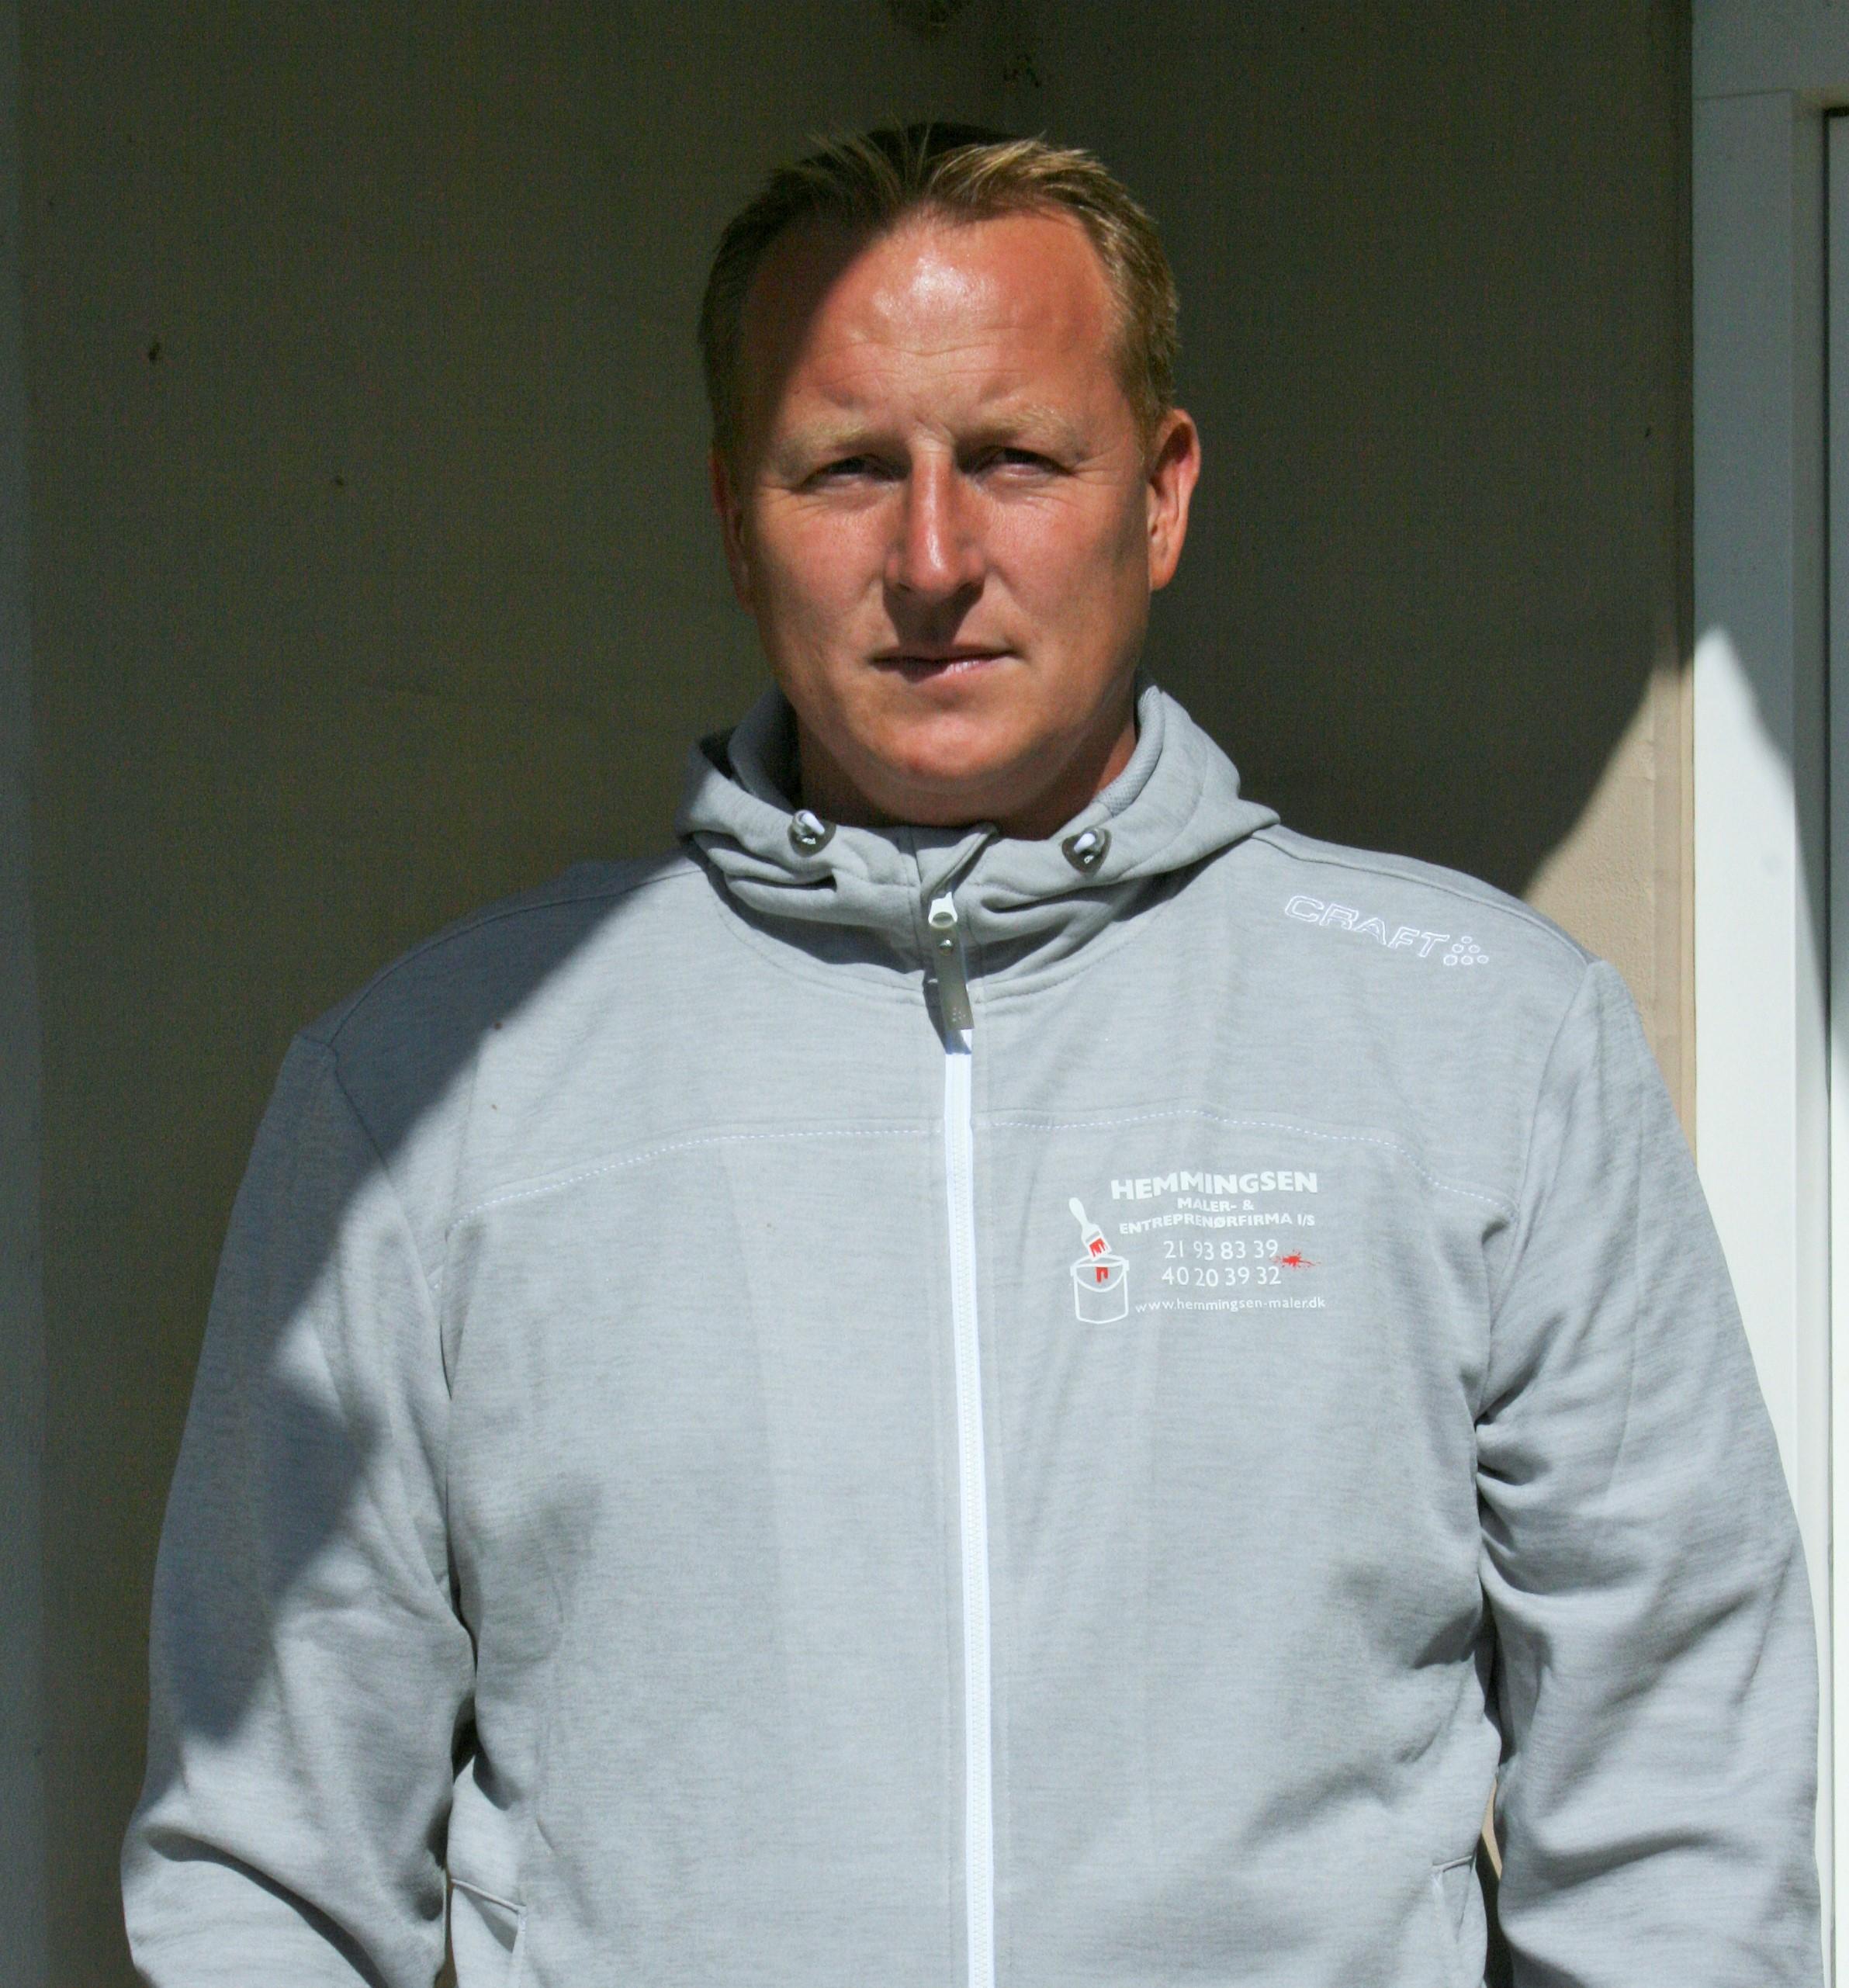 Jens Hjemmeside